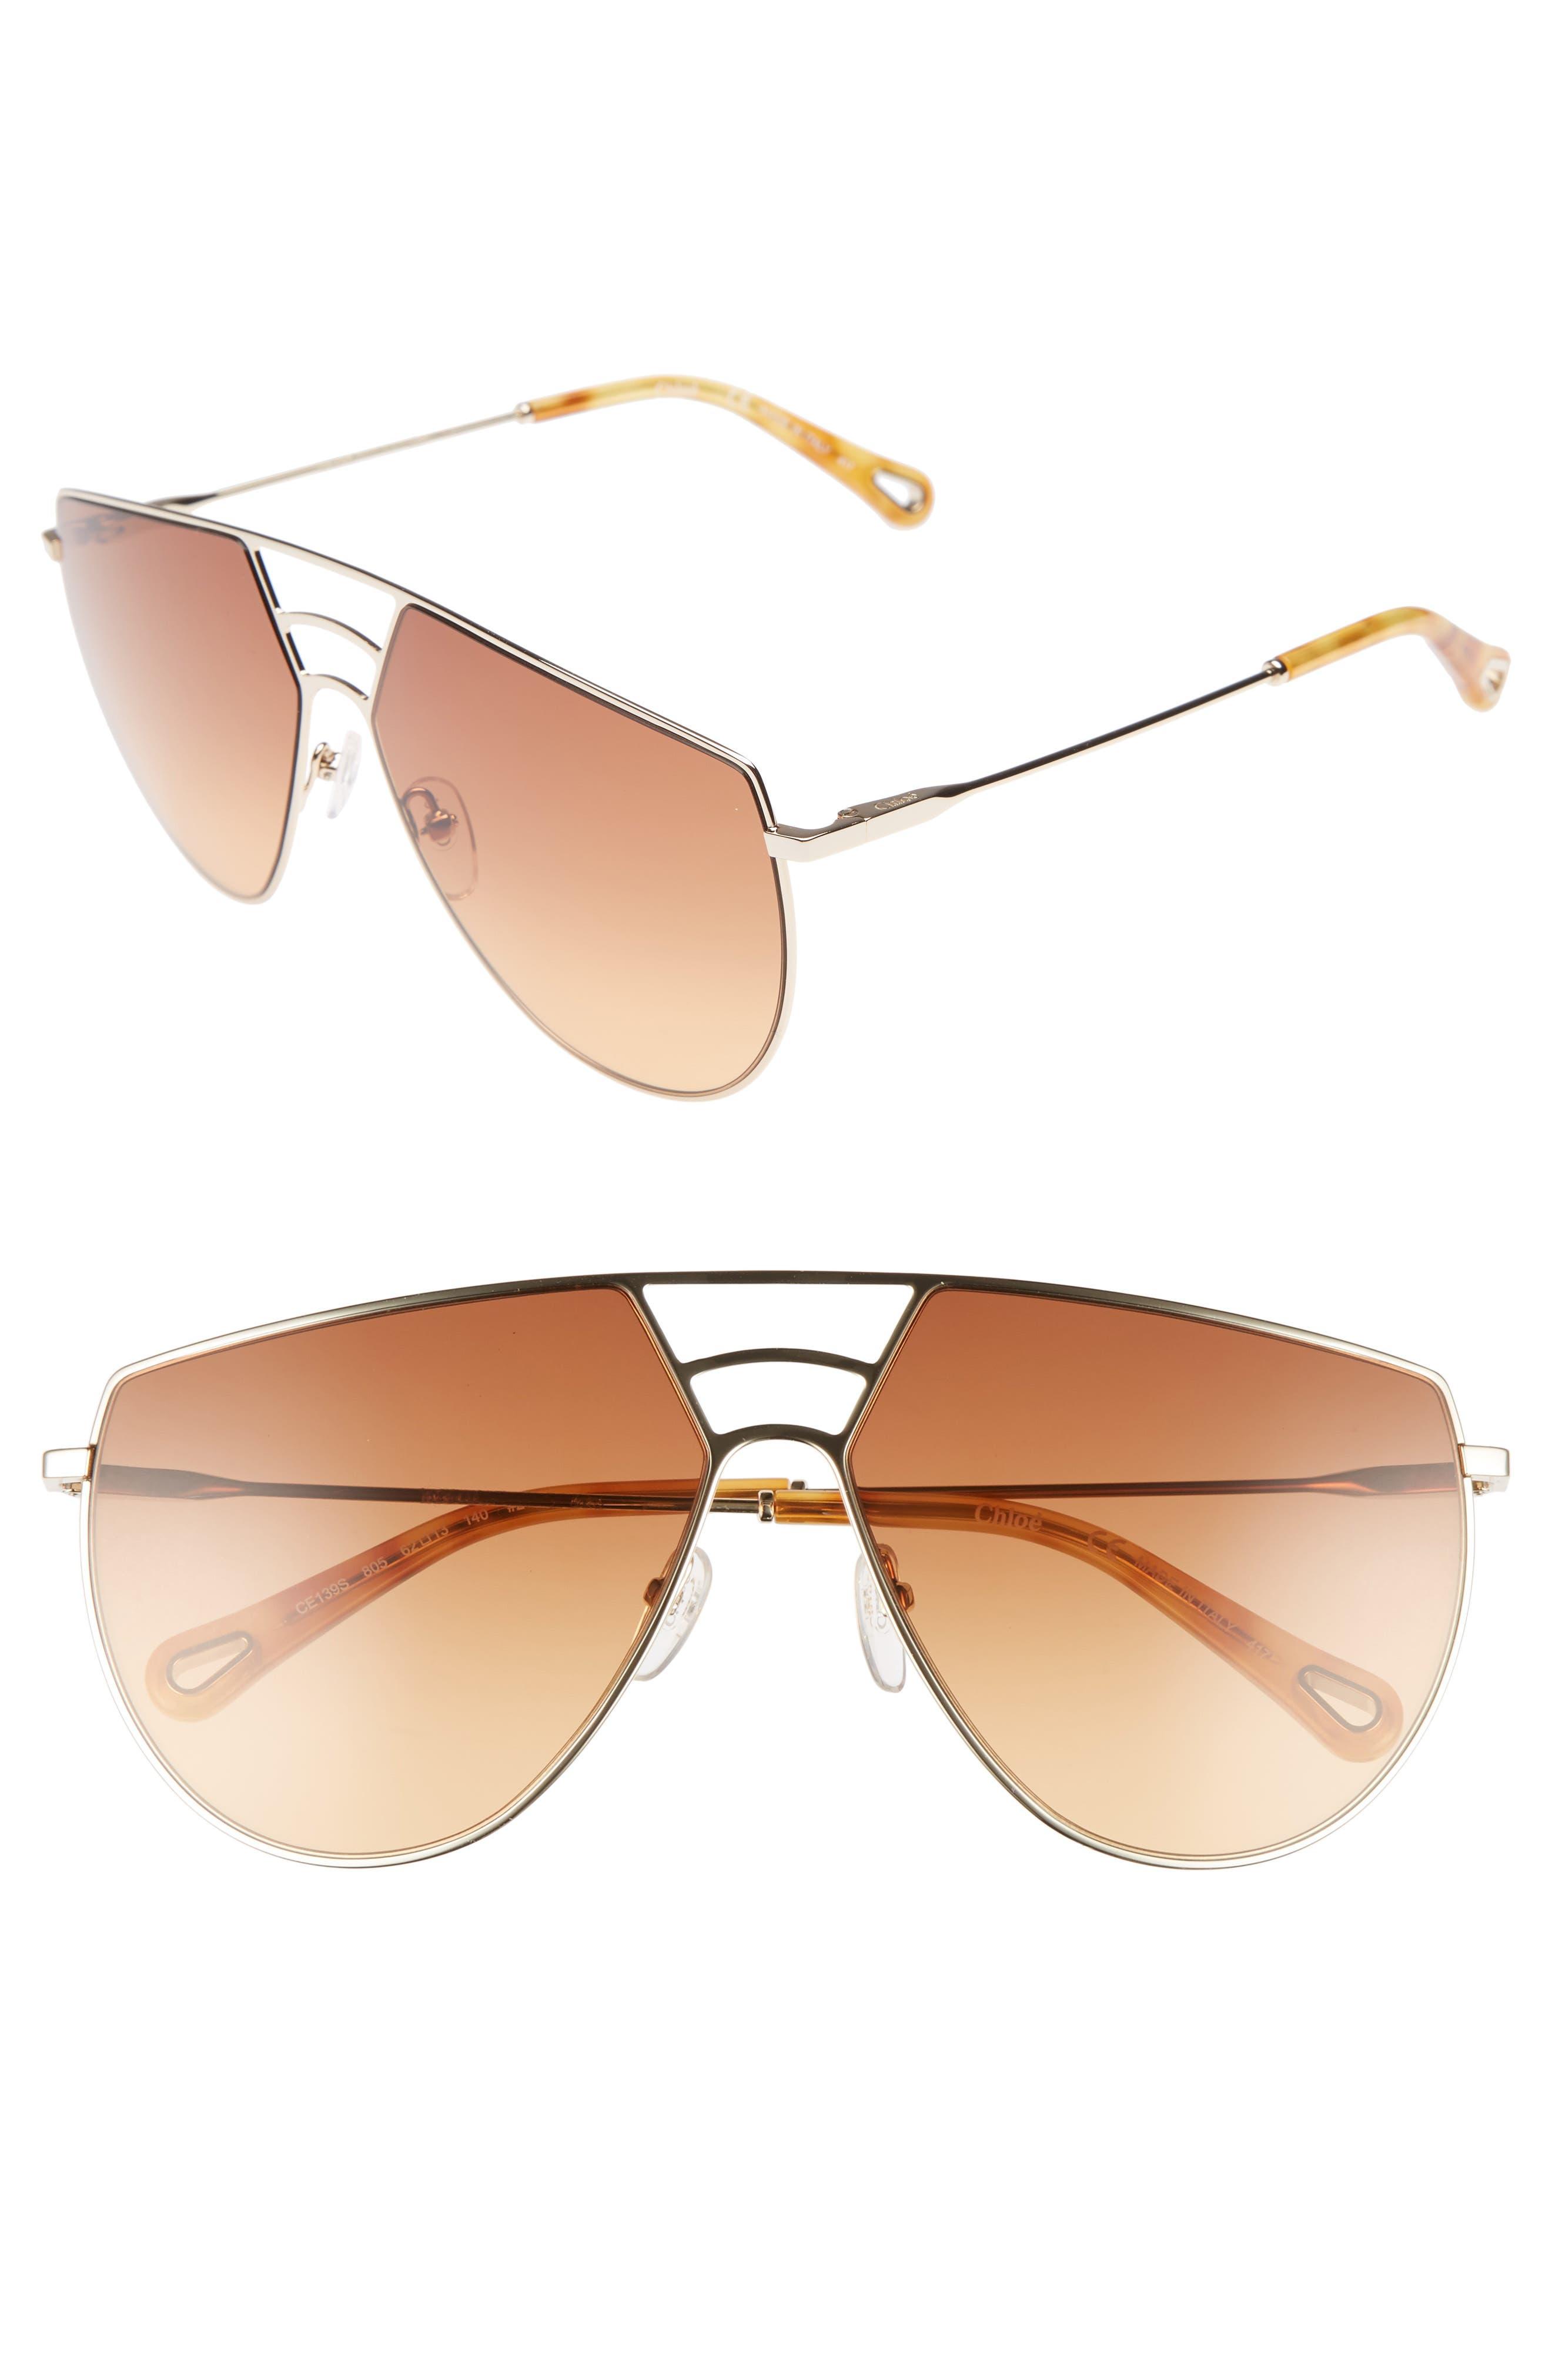 Chloé Negative Space 62mm Oversize Aviator Sunglasses